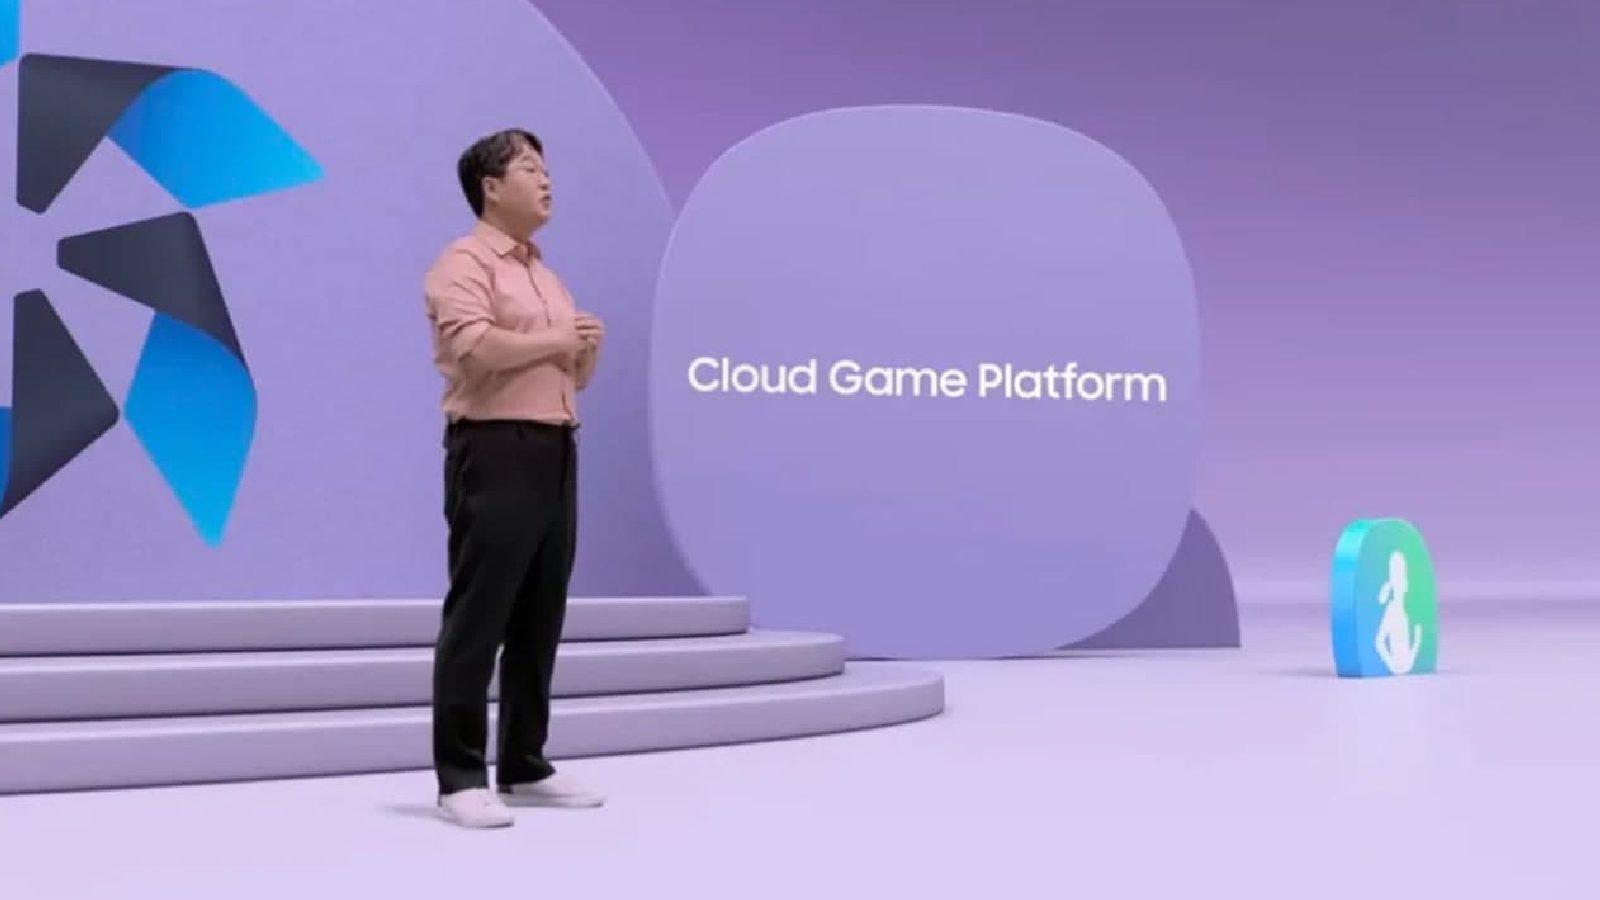 Cloud Game Platform